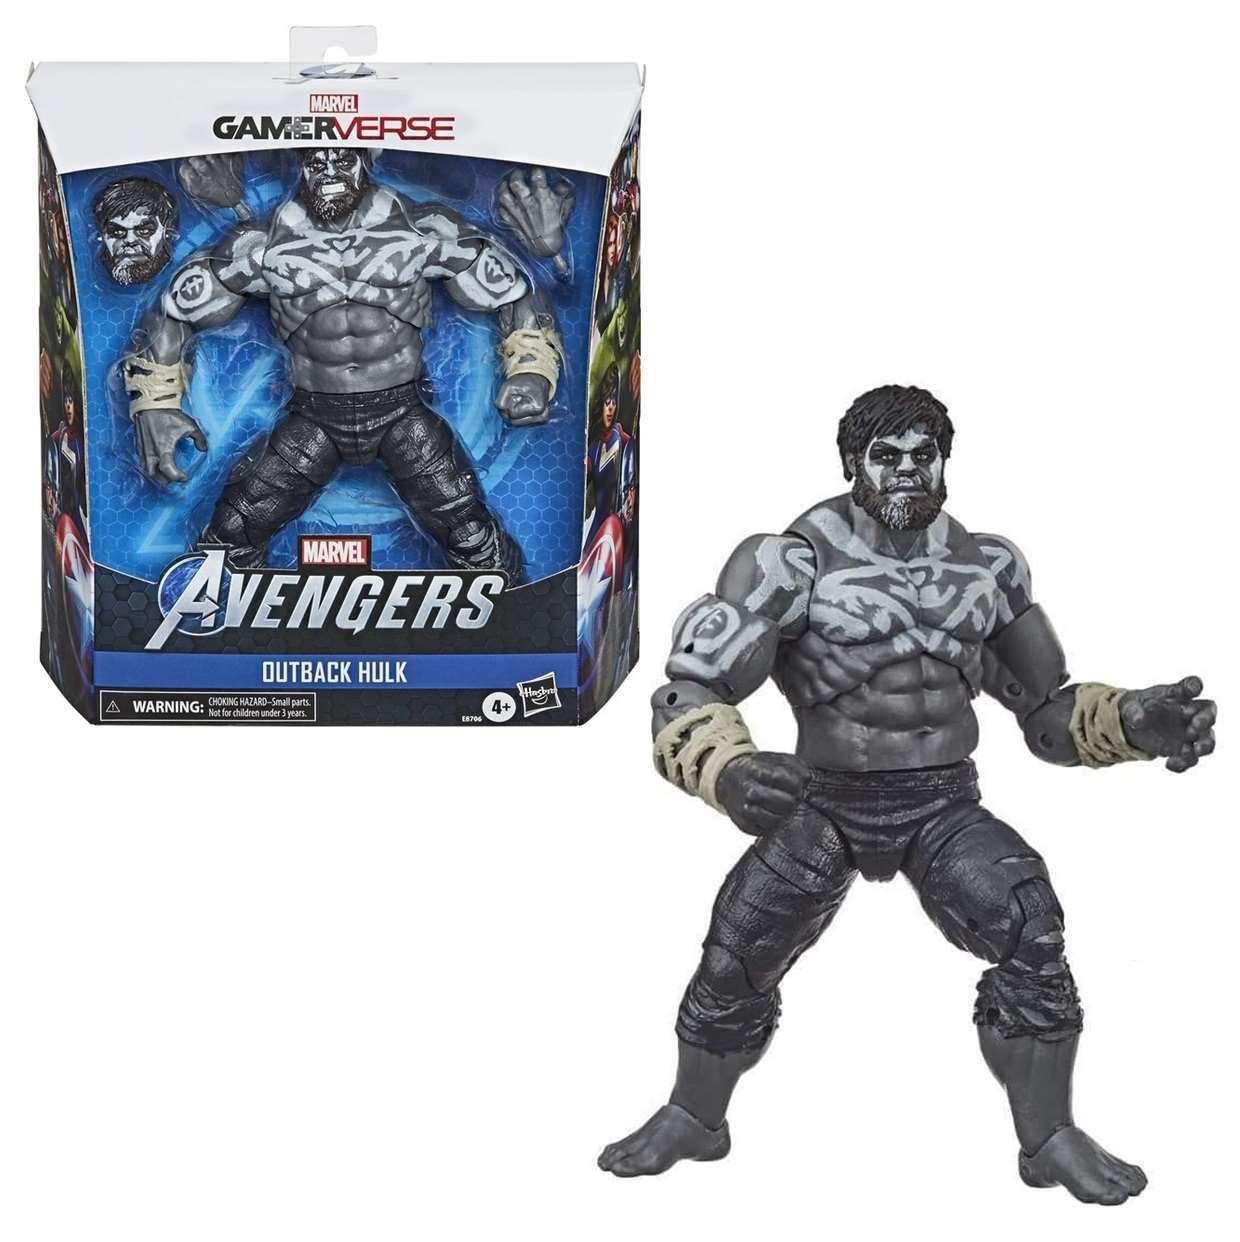 Outback Hulk Figura Marvel Avengers Gamerverse 6 Pulgadas